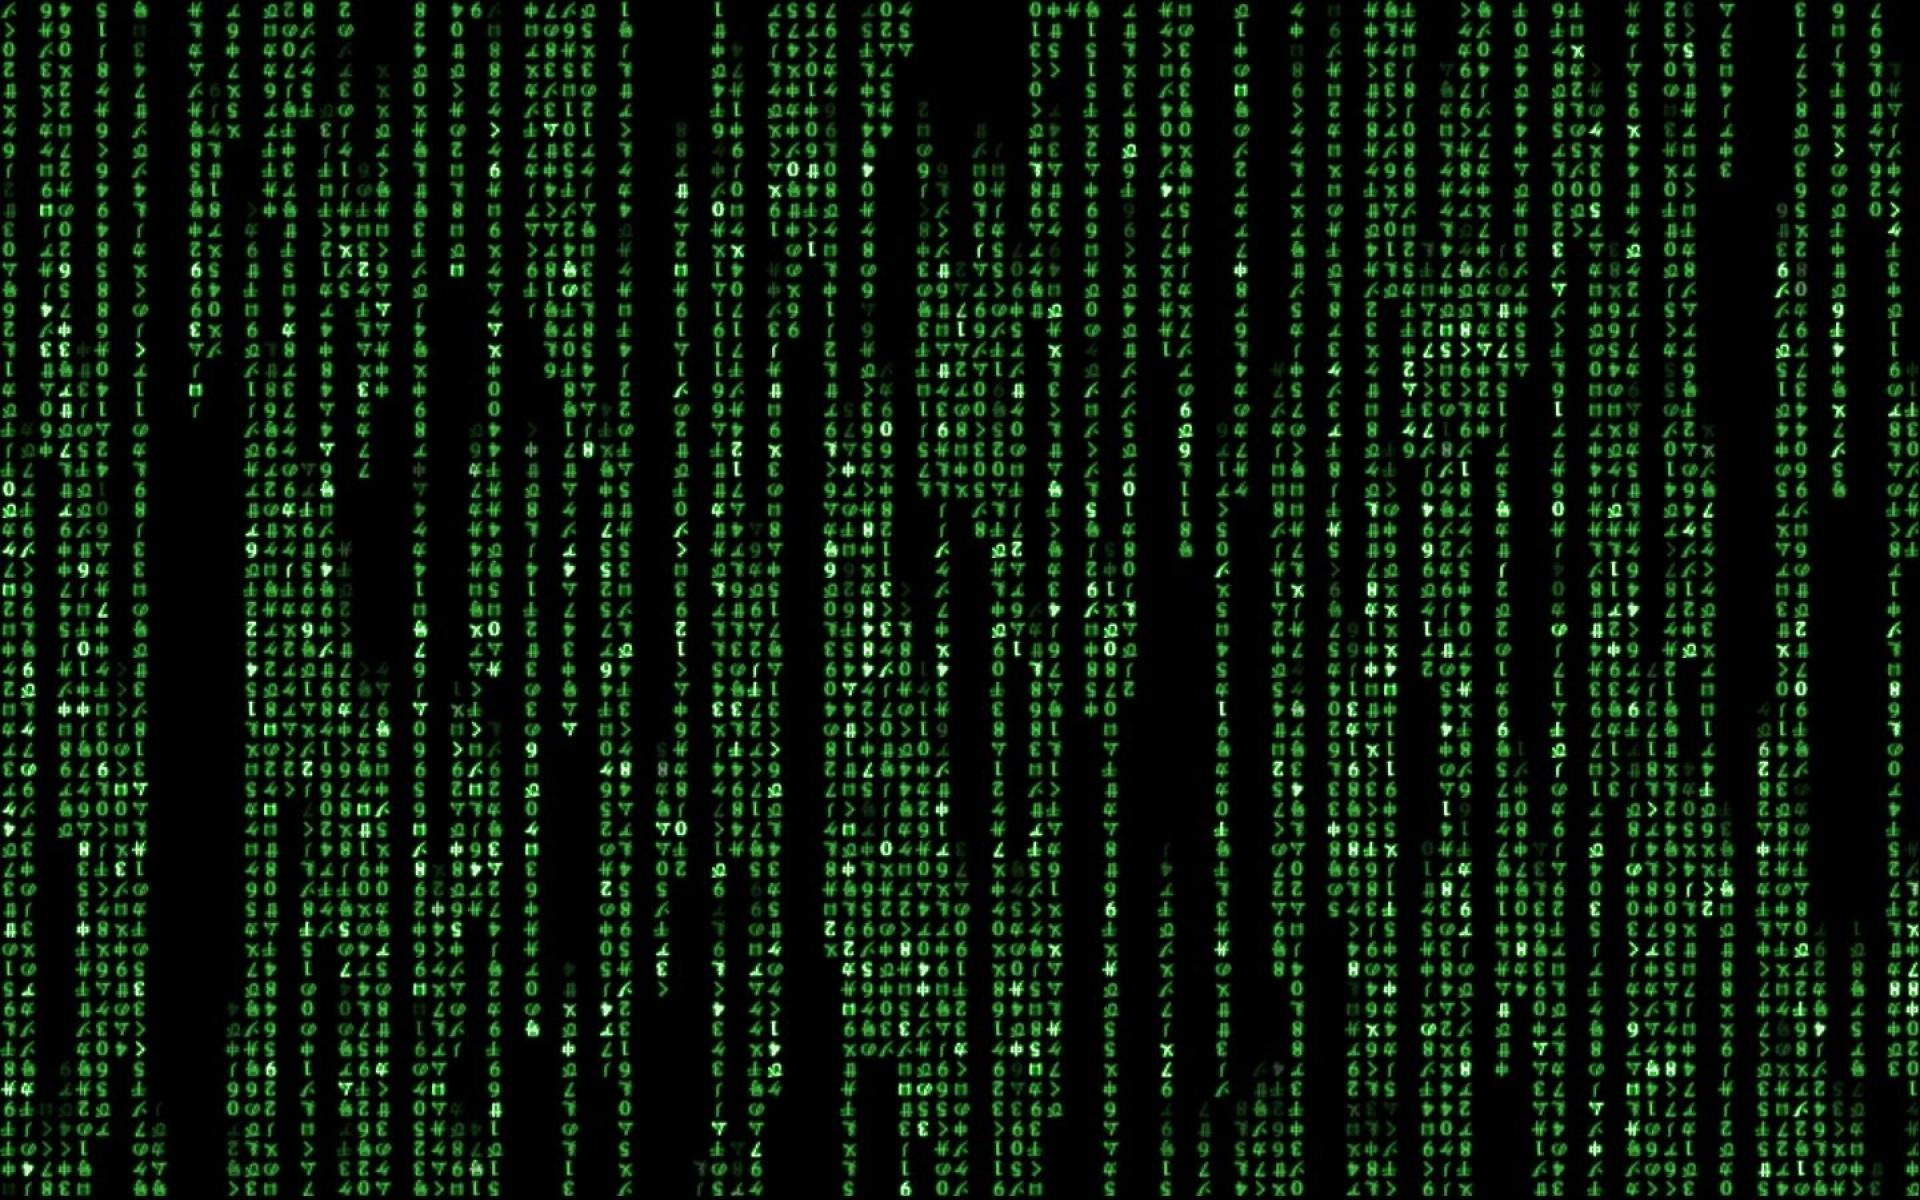 Matrix Background wallpaper 211252 1920x1200